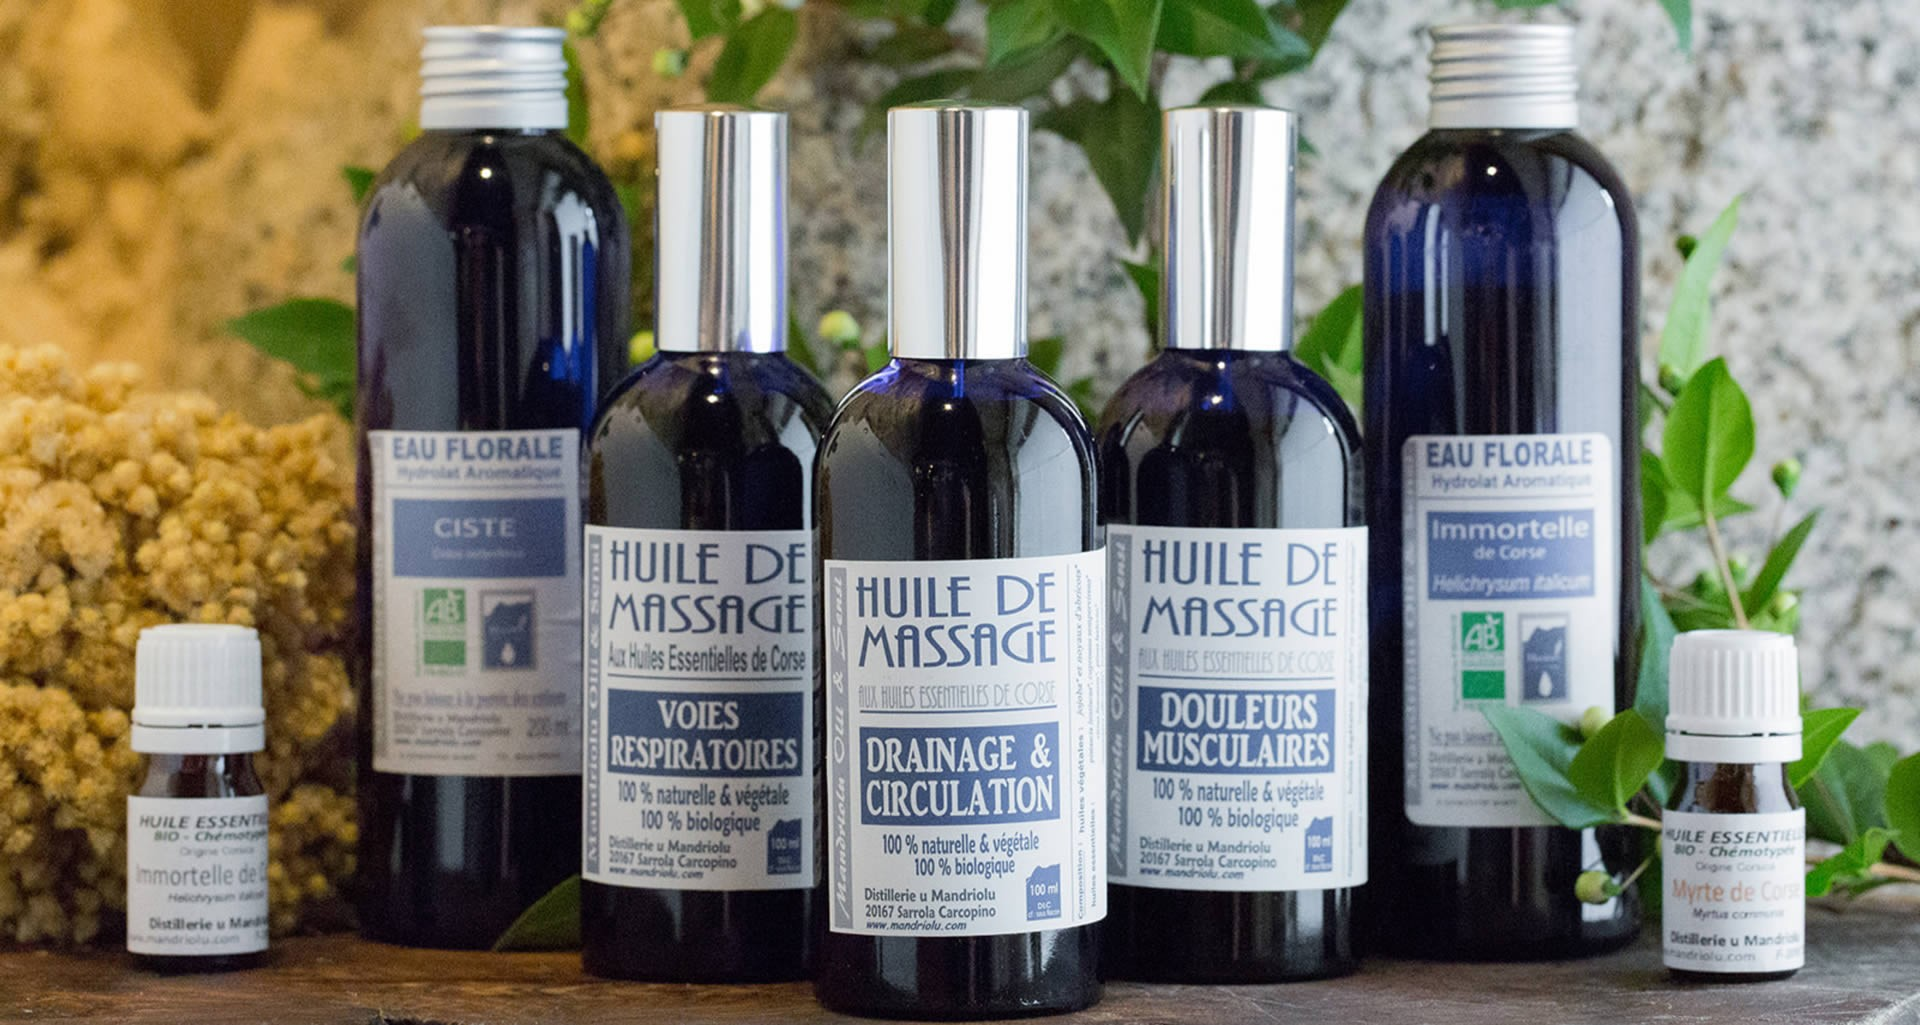 Les Huiles Essentielles Bio de Corse